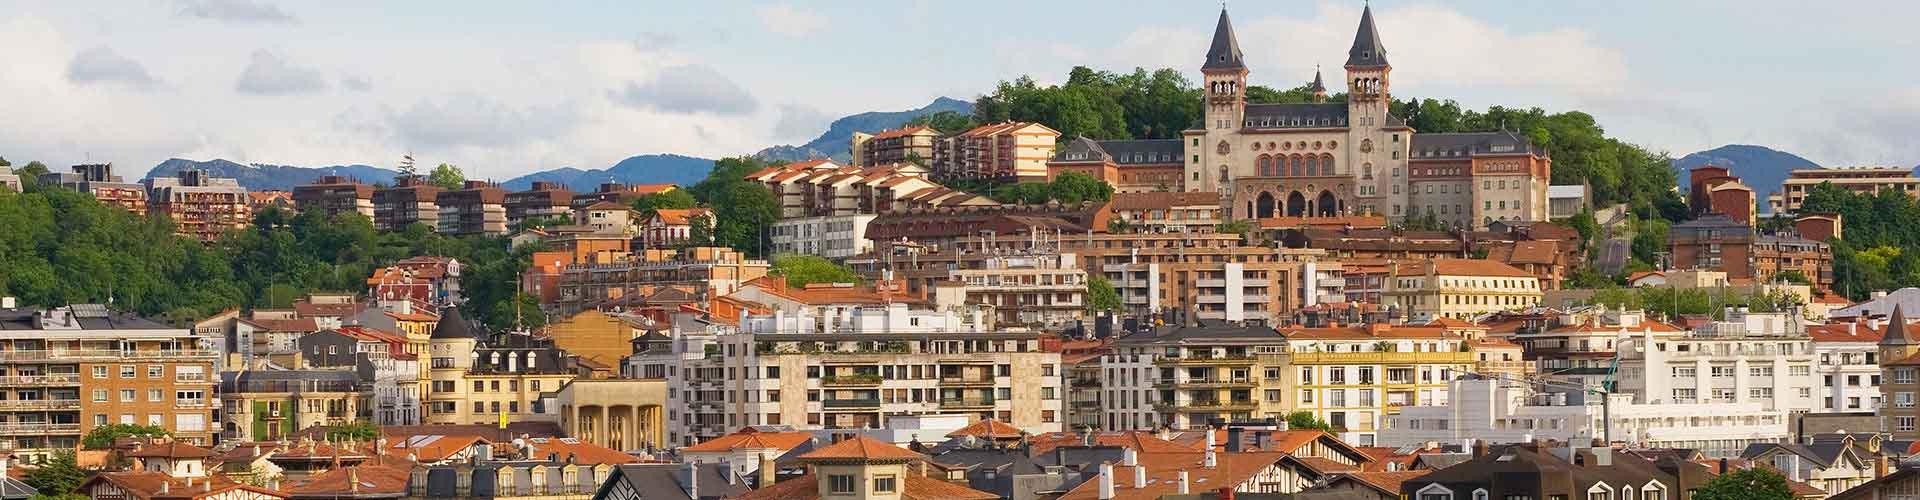 San Sebastián - Hostales en San Sebastián. Mapas de San Sebastián, Fotos y comentarios de cada Hostal en San Sebastián.